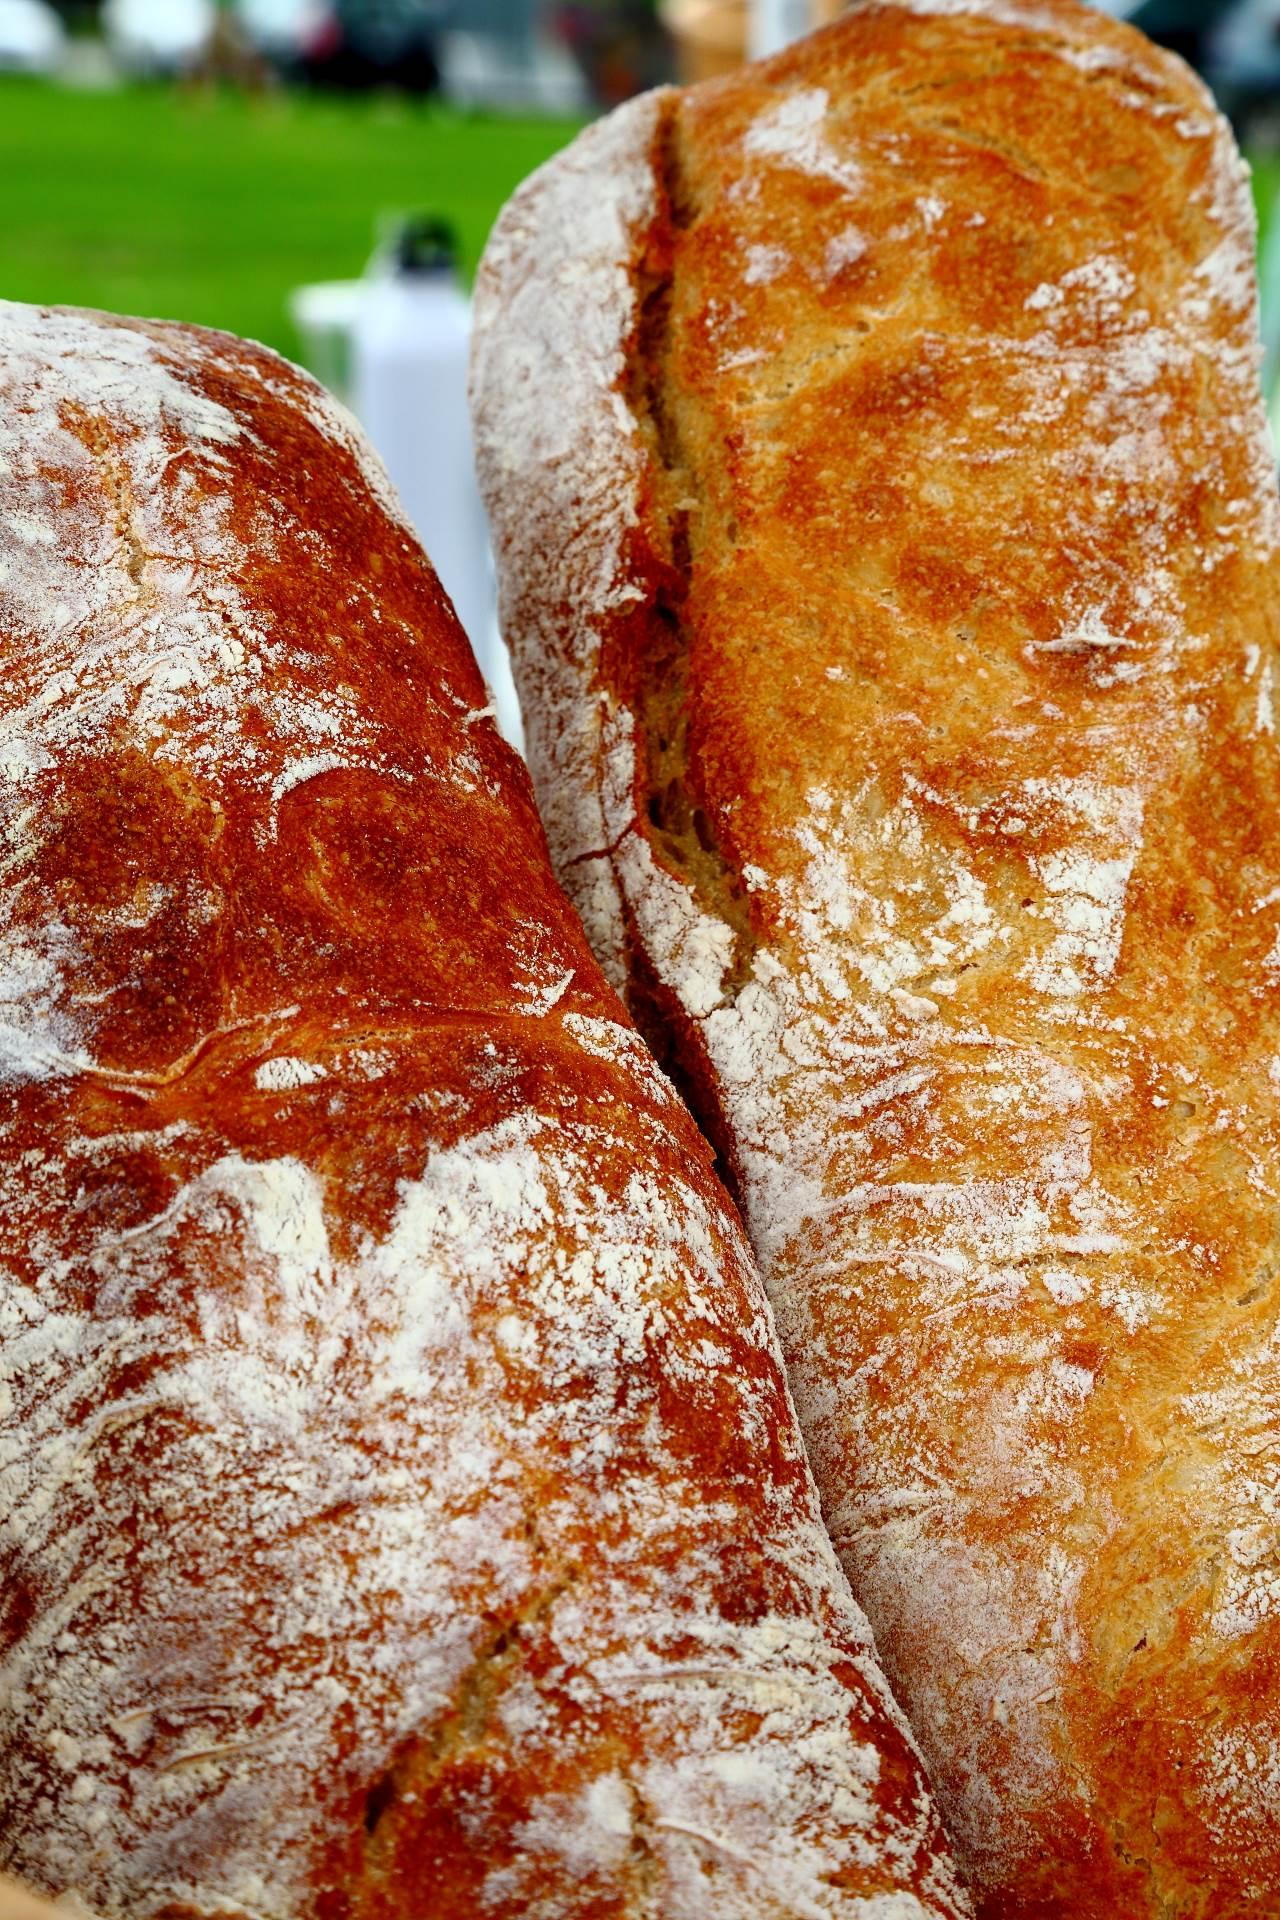 Chiabatta - Farmer's Market fresh chiabatta bread. by D Scott Smith